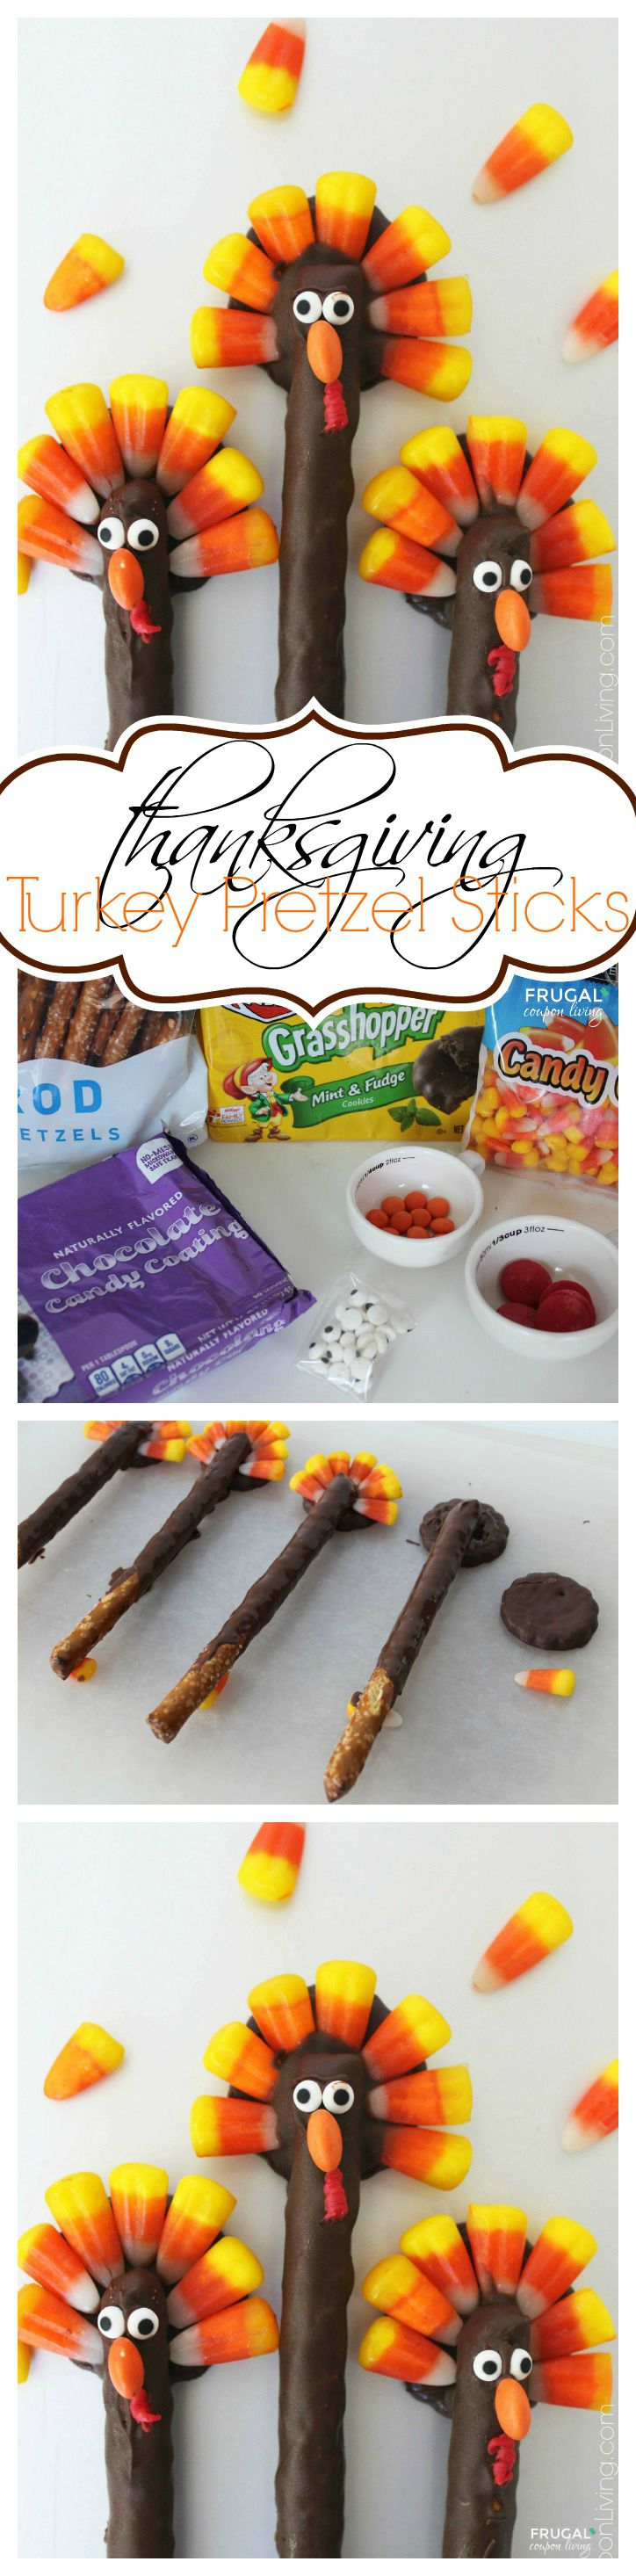 thanksgiving-turkey-pretzels-frugal-coupon-living-pinterest-Collage-url